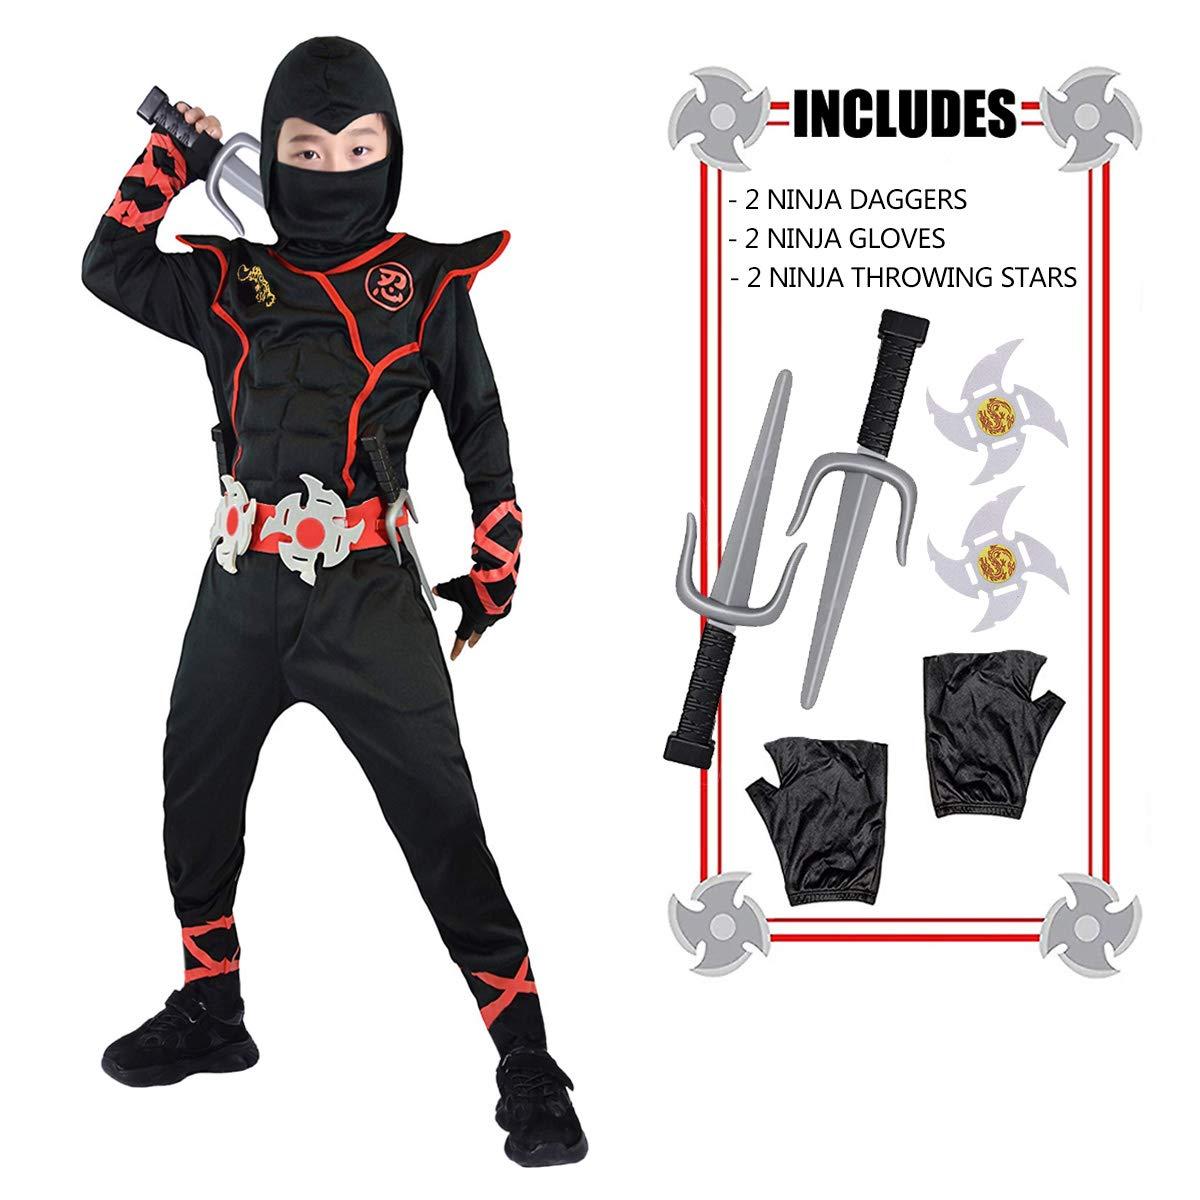 Halloween Ninja Costumes for Boys Girls - Ninja Gift Ideas